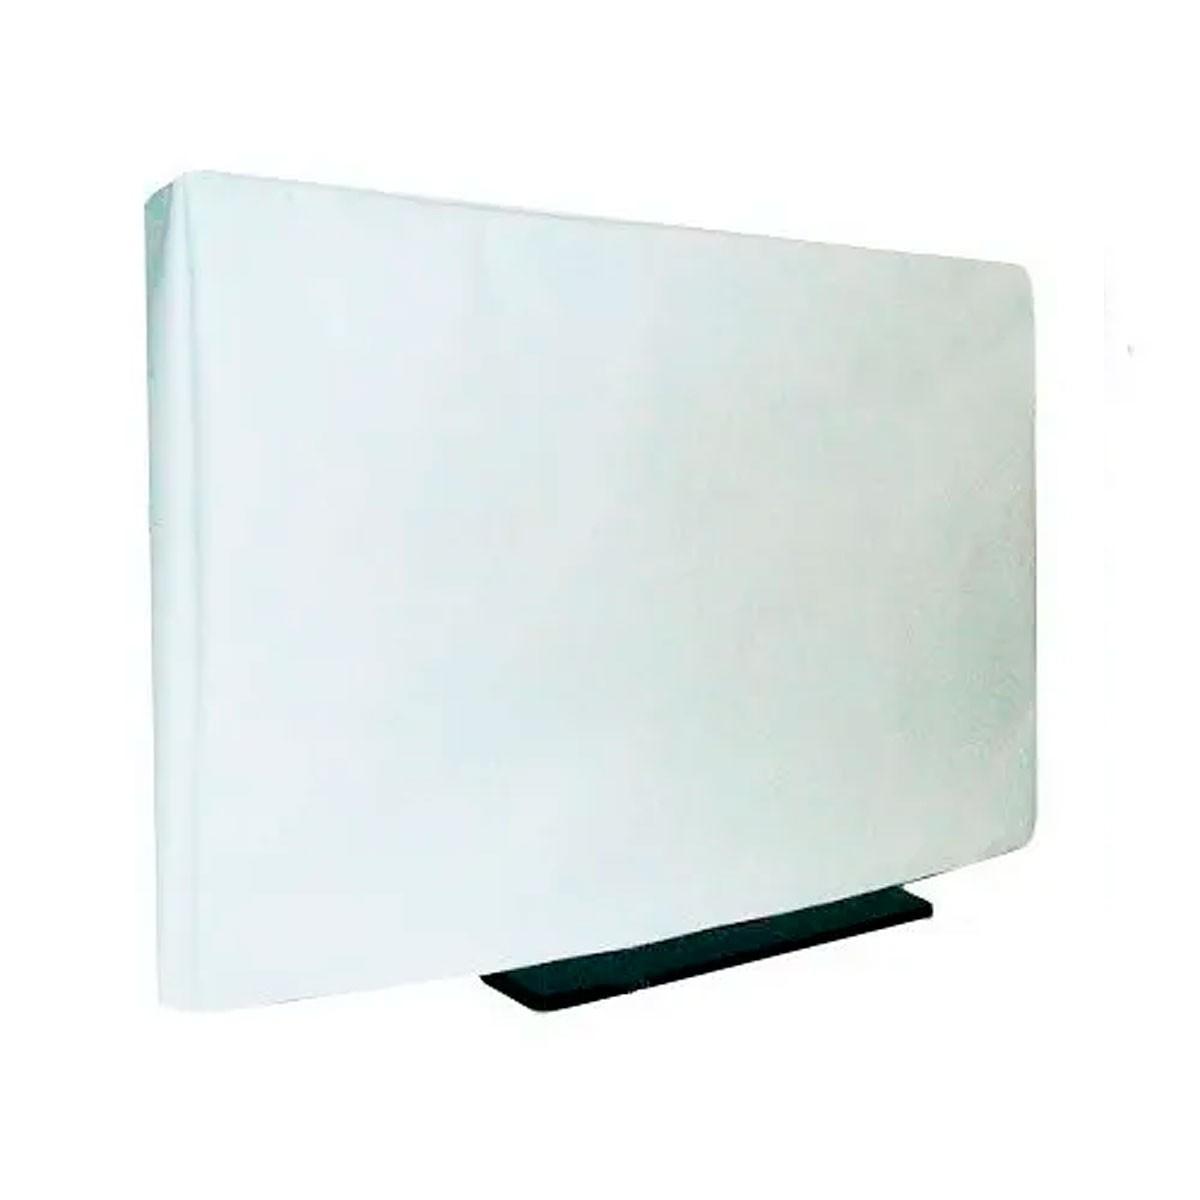 Capa Para TV De Luxo Em Corino Para TV LED e LCD - COR BRANCA